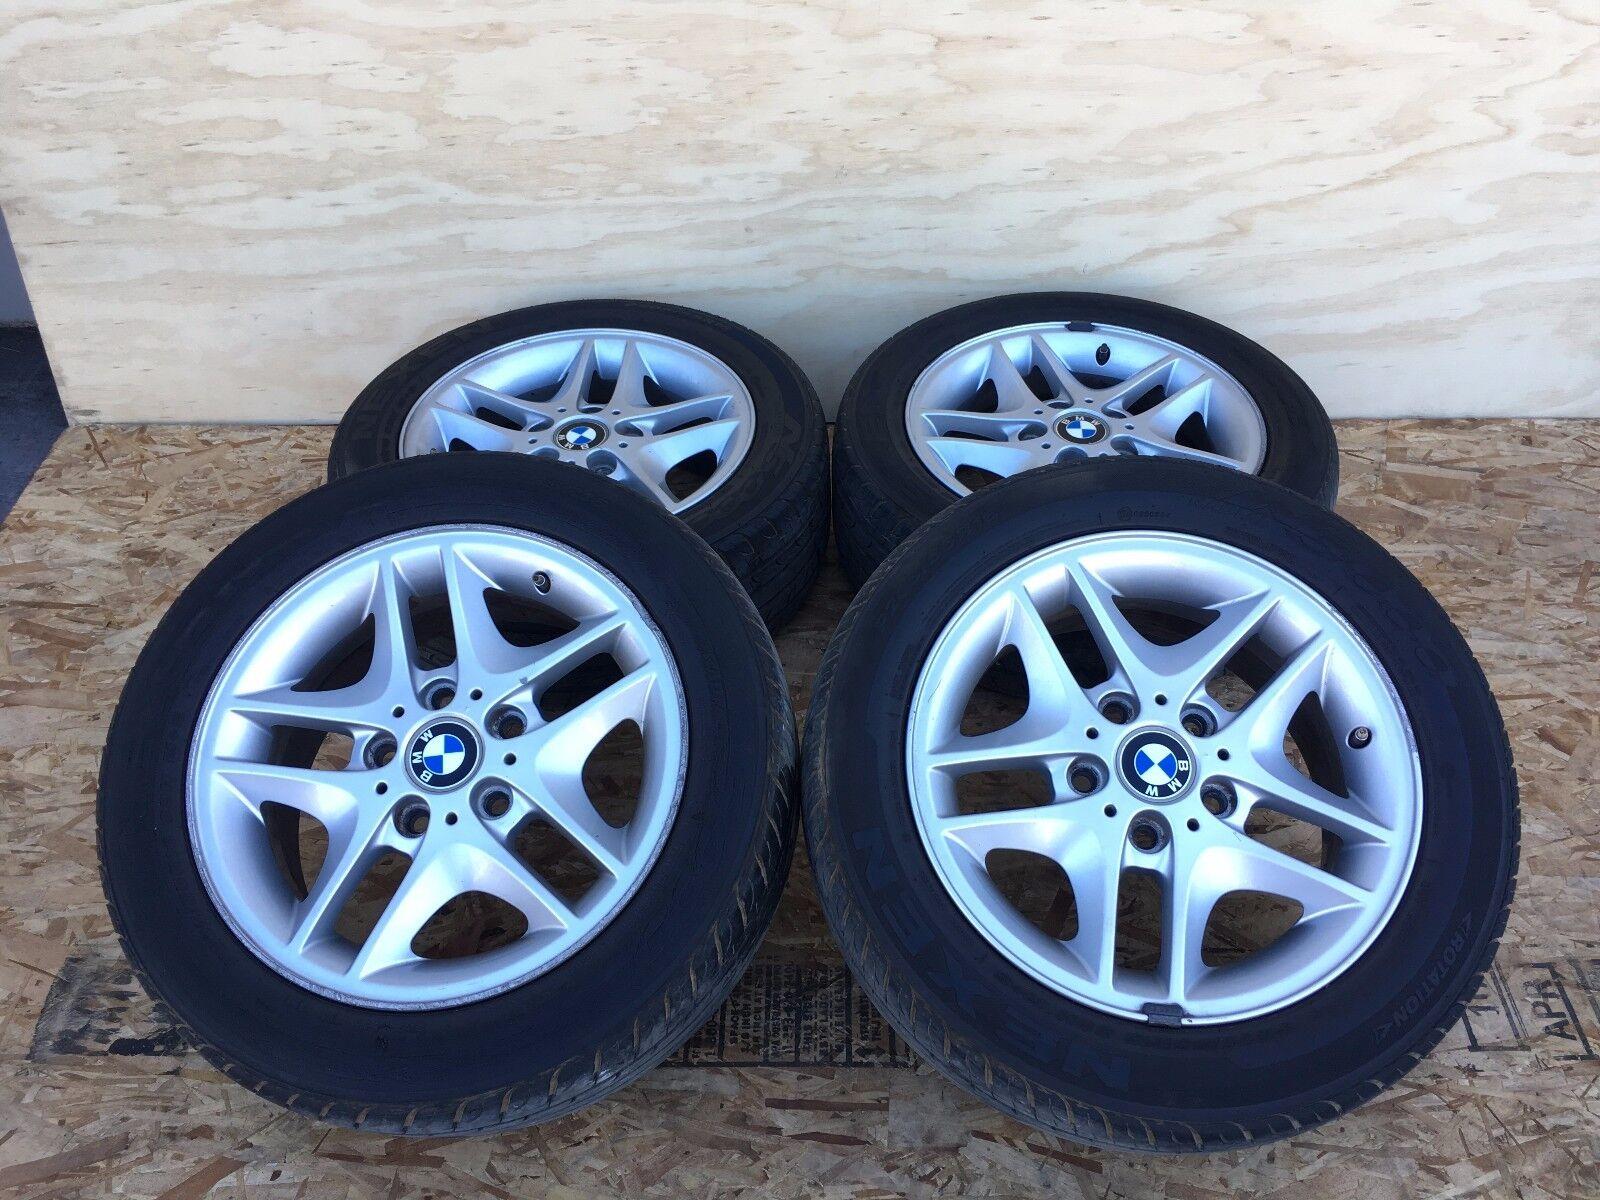 Used Bmw 330i A C Compressors And Clutches For Sale Kompresor Seri 3 E46 Denso 330ci 325ci 325i 2001 2006 Oem Rims Wheels Tires 16 Set 87k